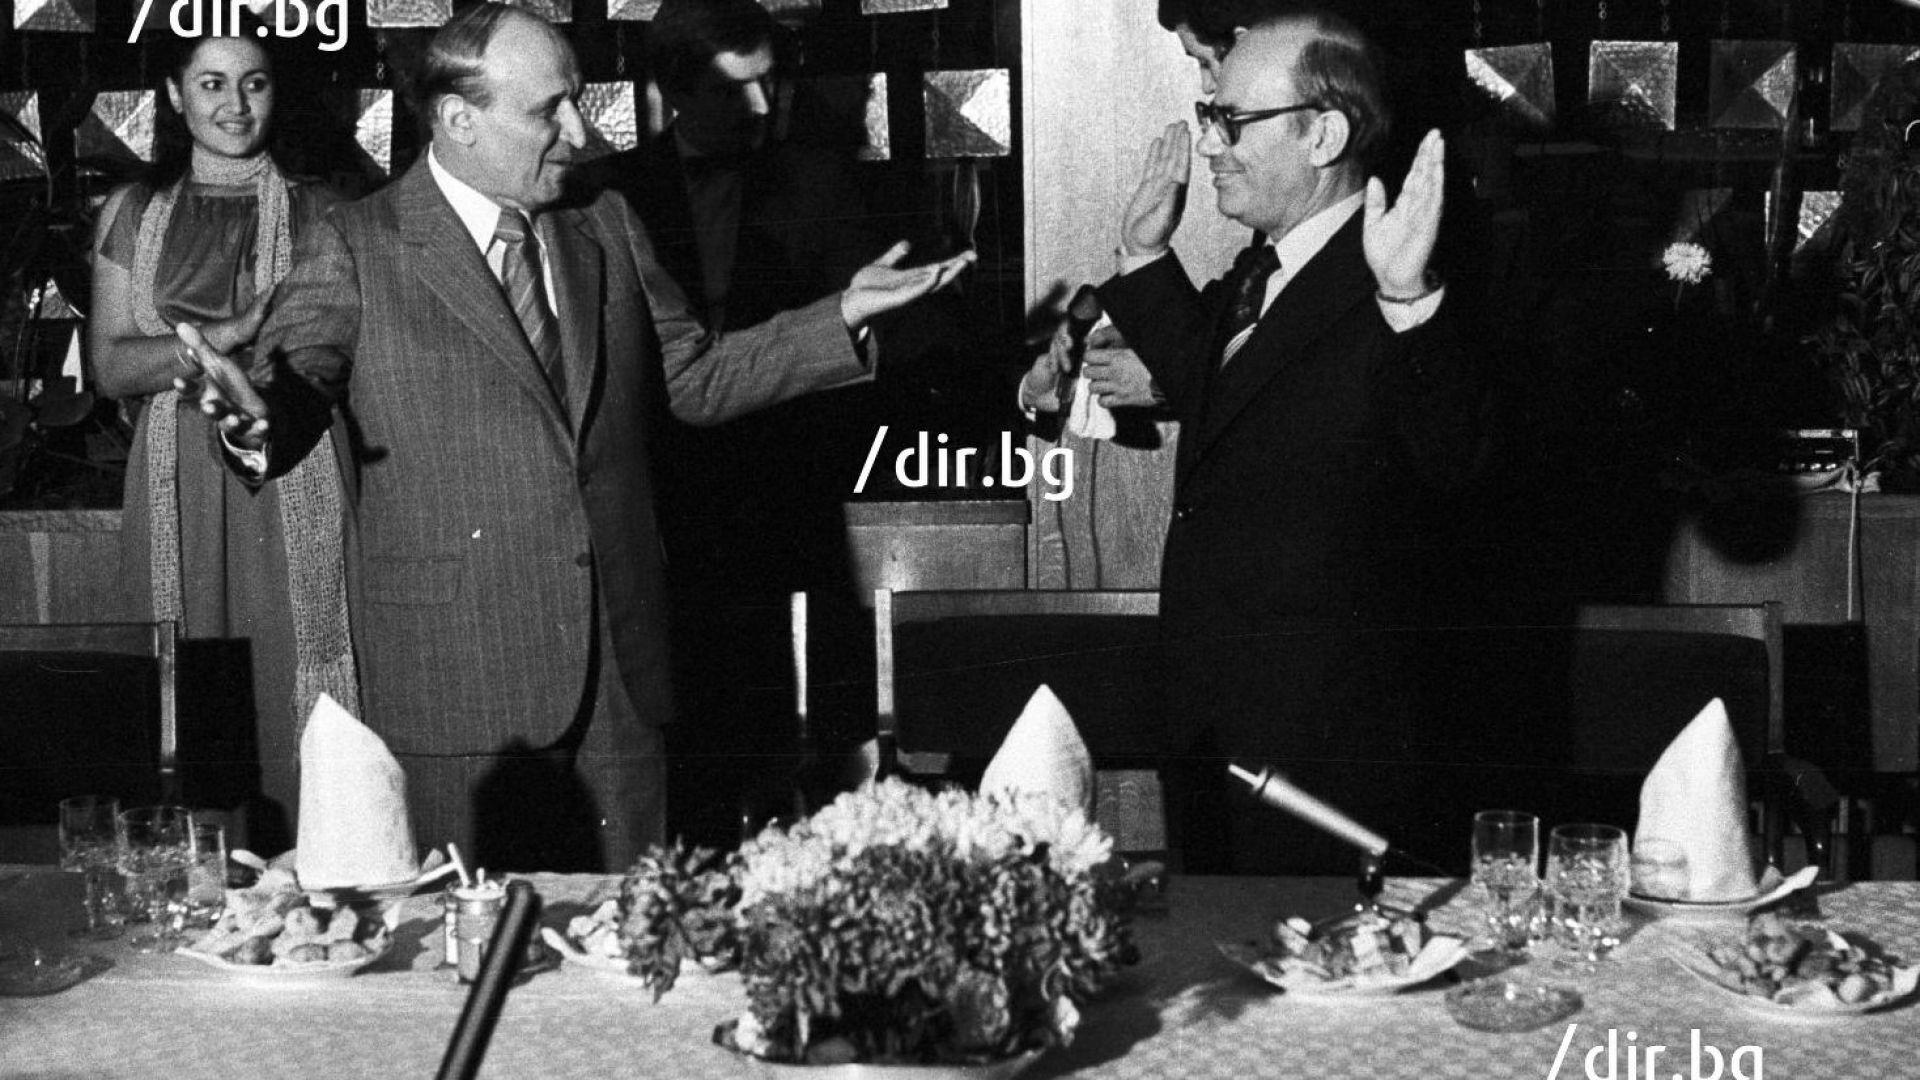 Лимузини, лов и пищни приеми: Как НРБ посрещаше величия от ГДР и СССР